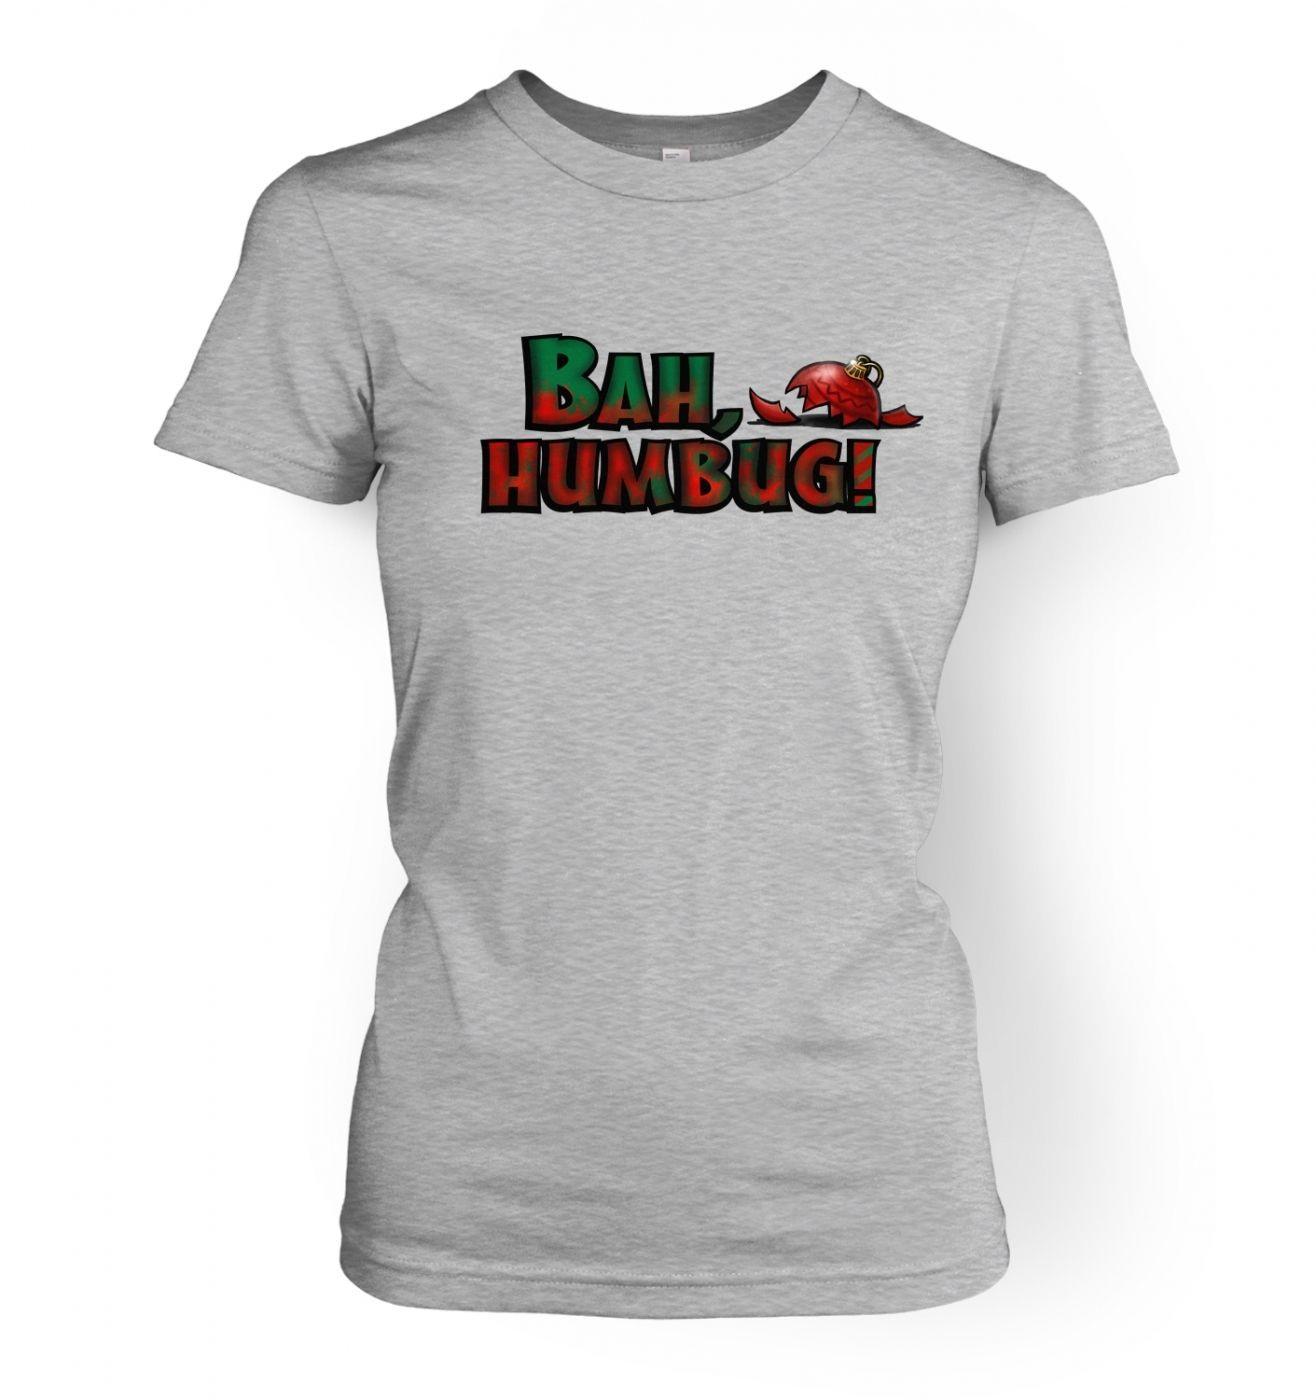 Women's Bah humbug! T-shirt